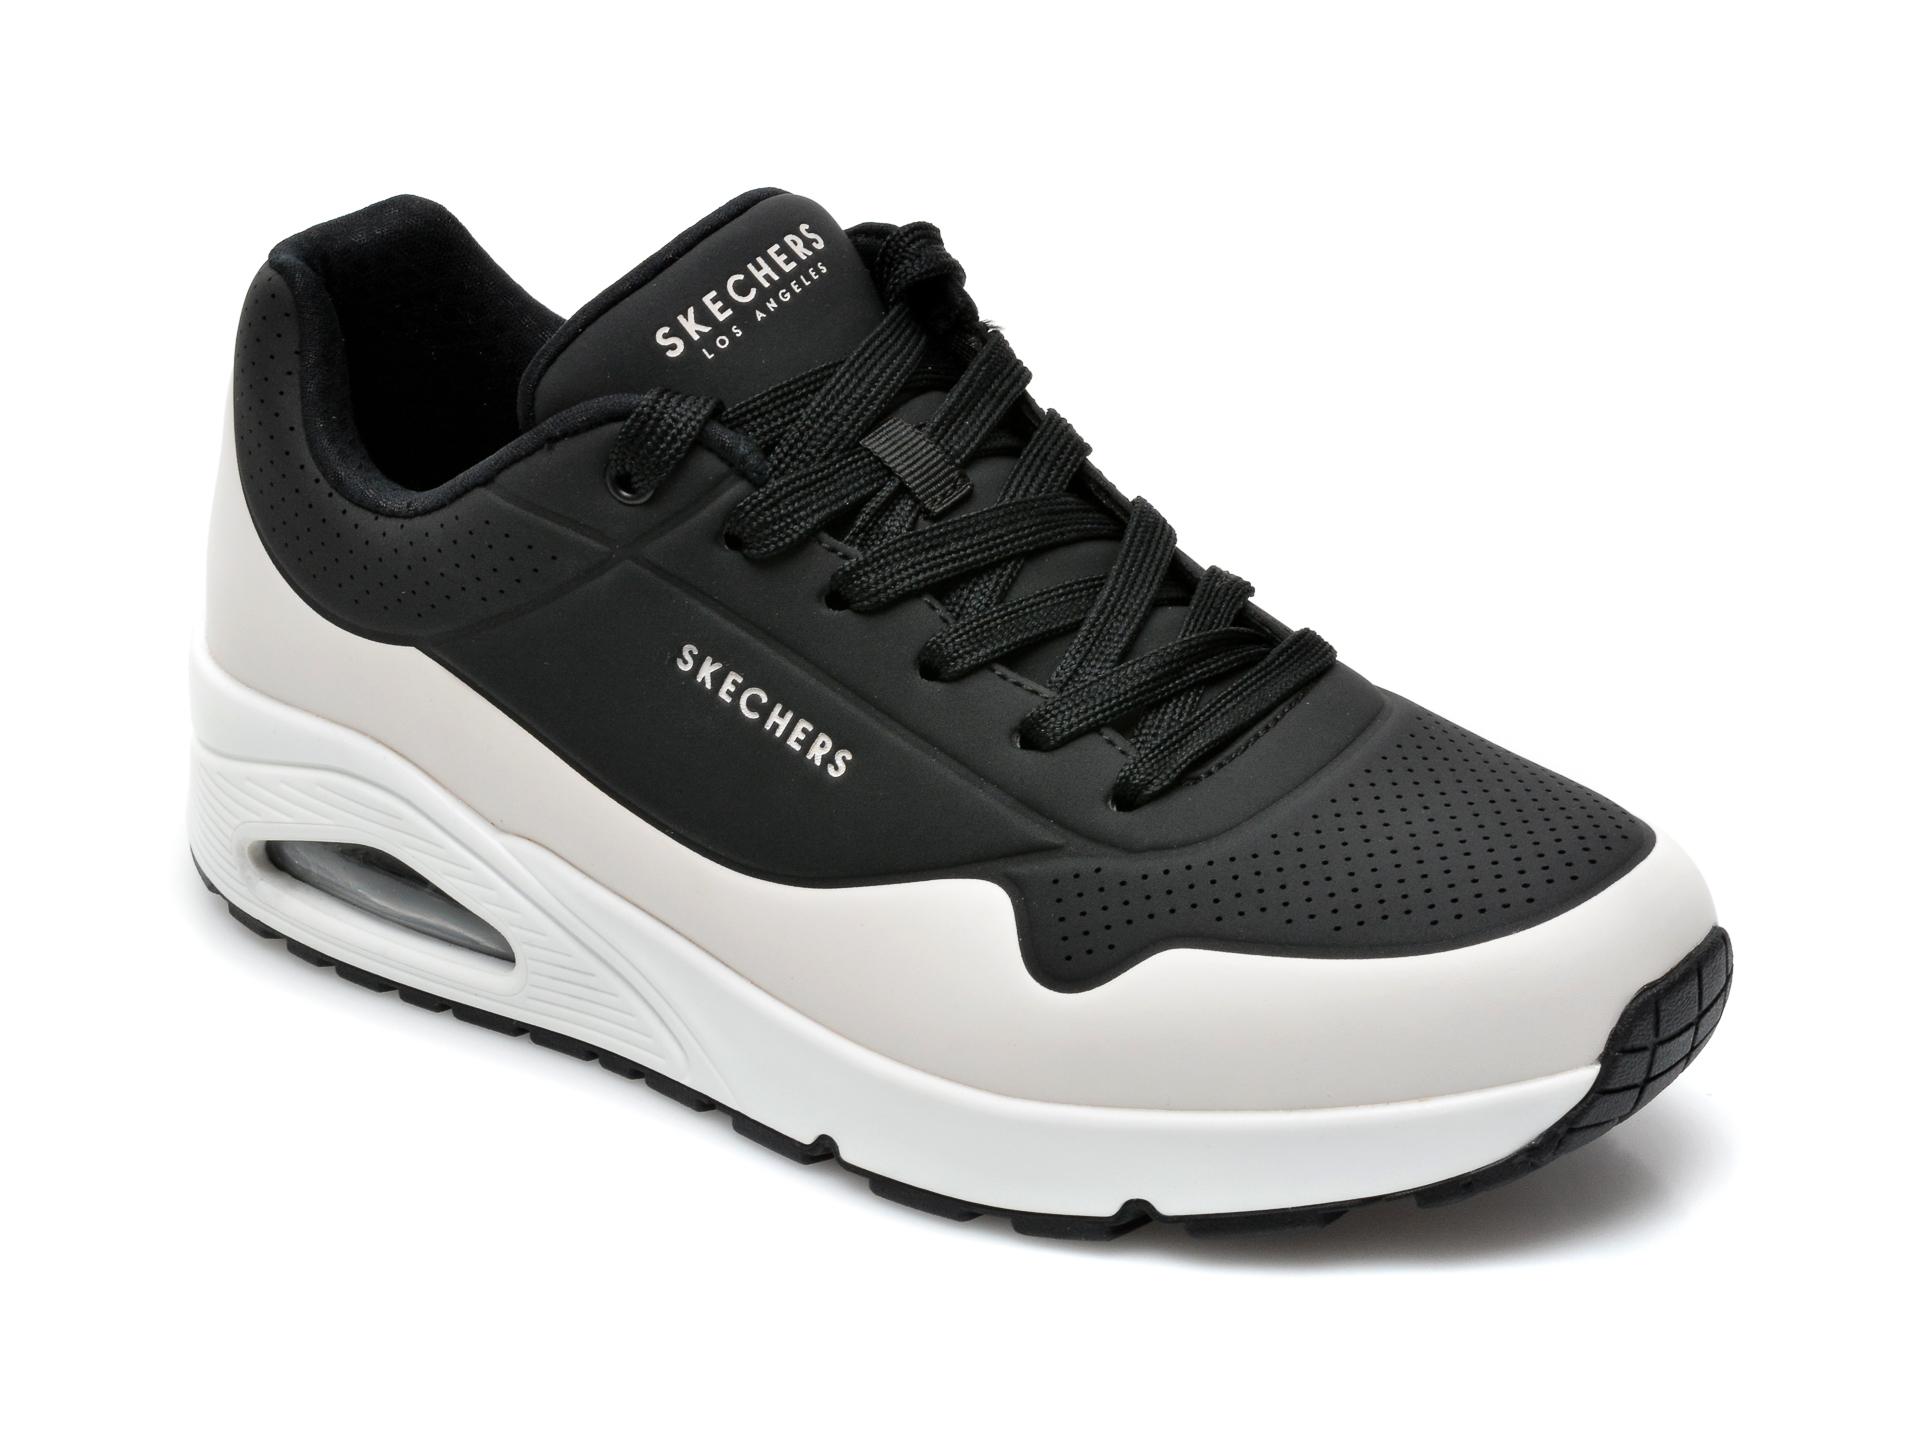 Pantofi sport SKECHERS negri, Uno, din piele ecologica imagine